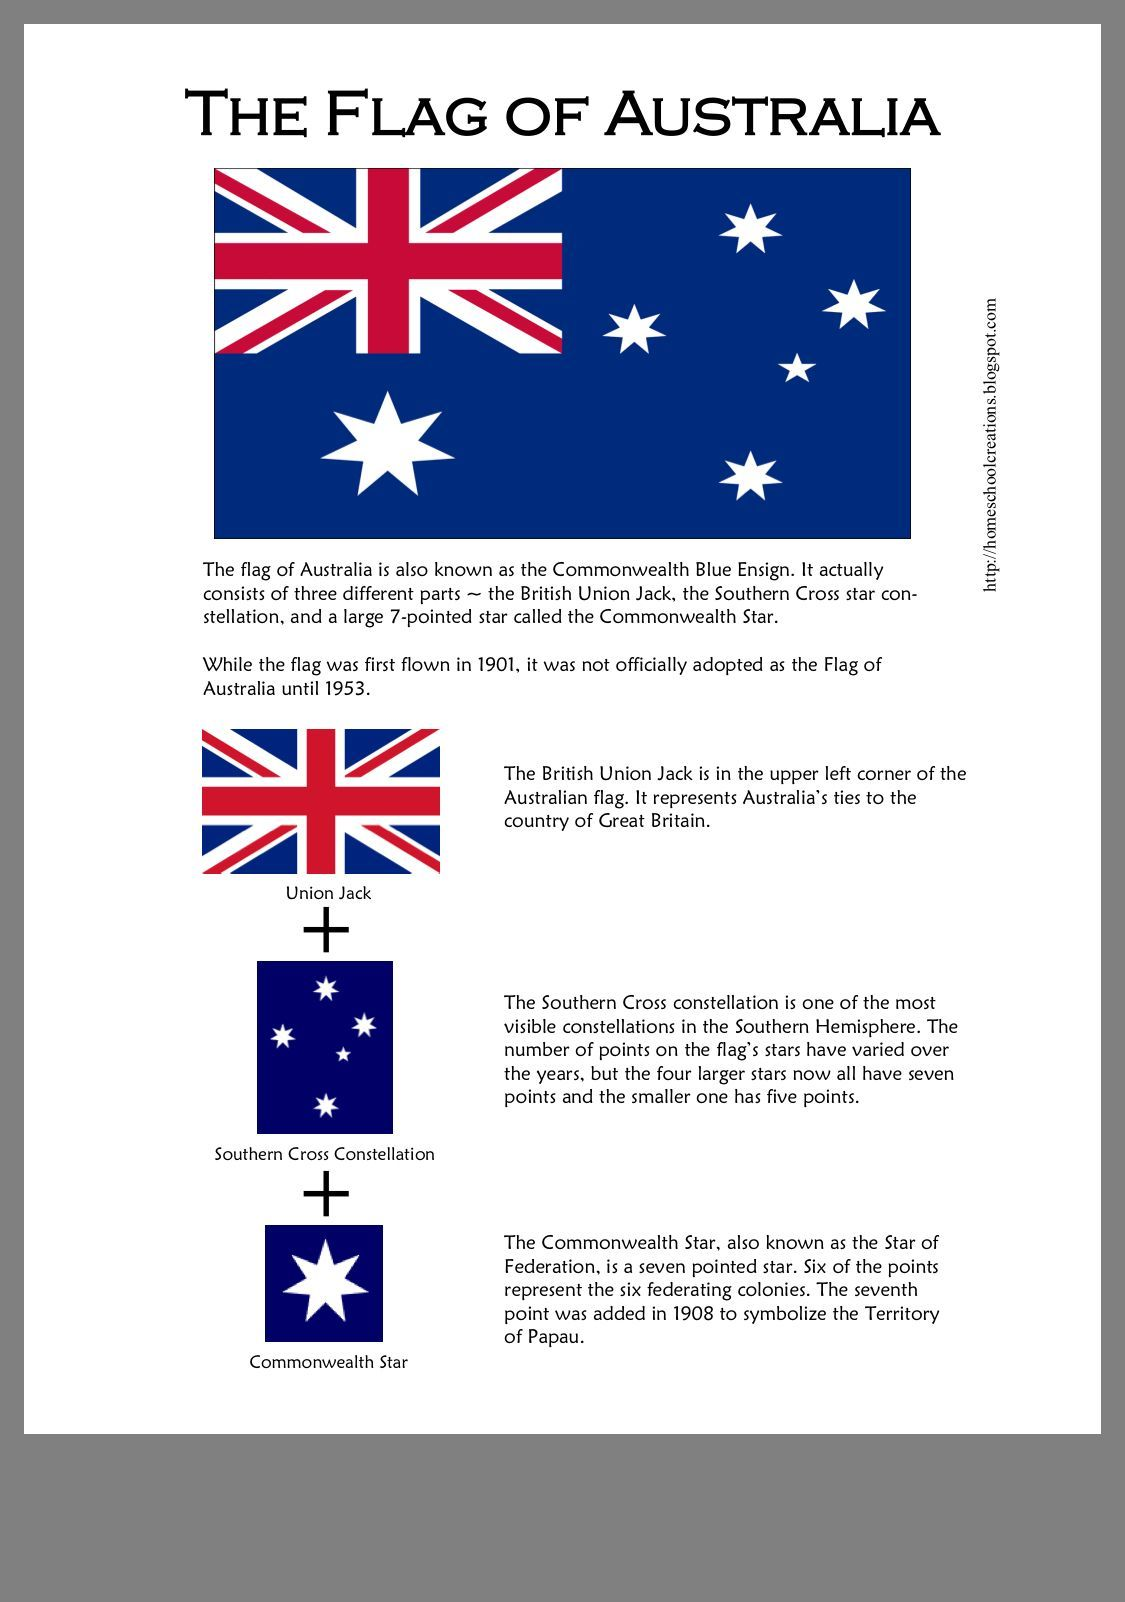 Pin By Grace16moore37 On Australian In 2020 Australia School Australia Crafts Australia Country